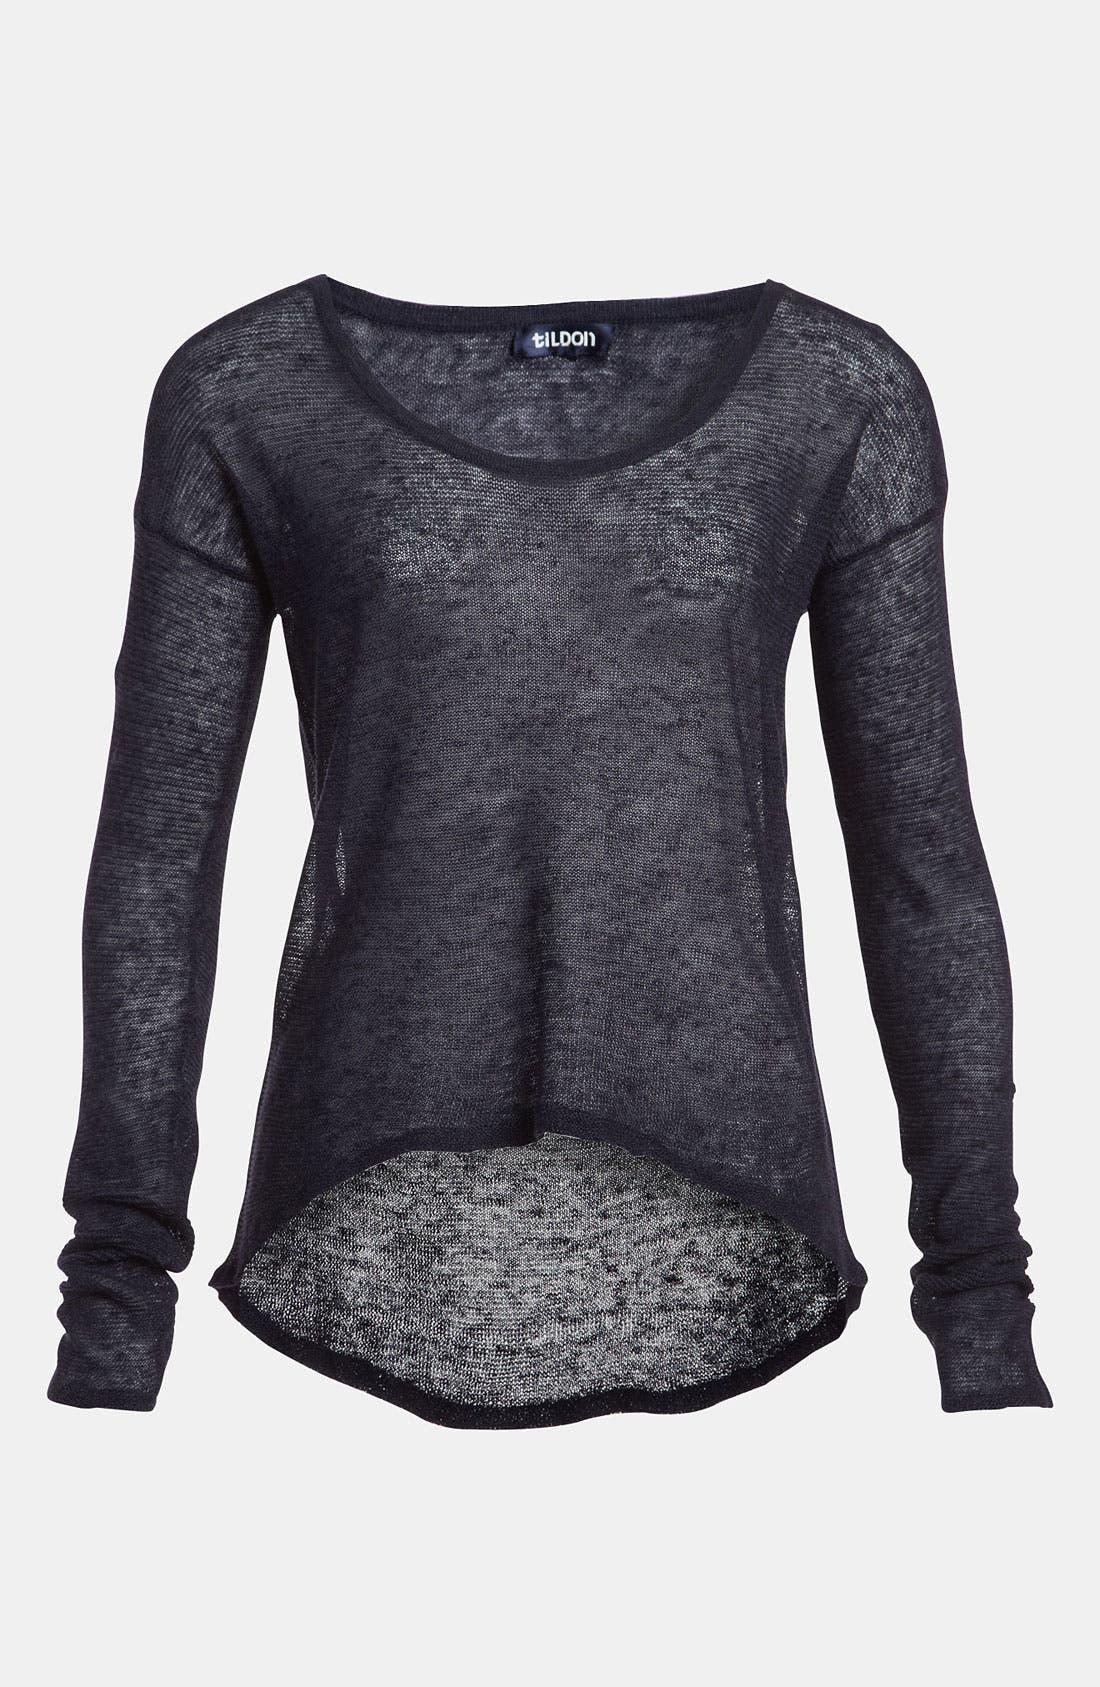 Main Image - Tildon Sheer High/Low Pullover